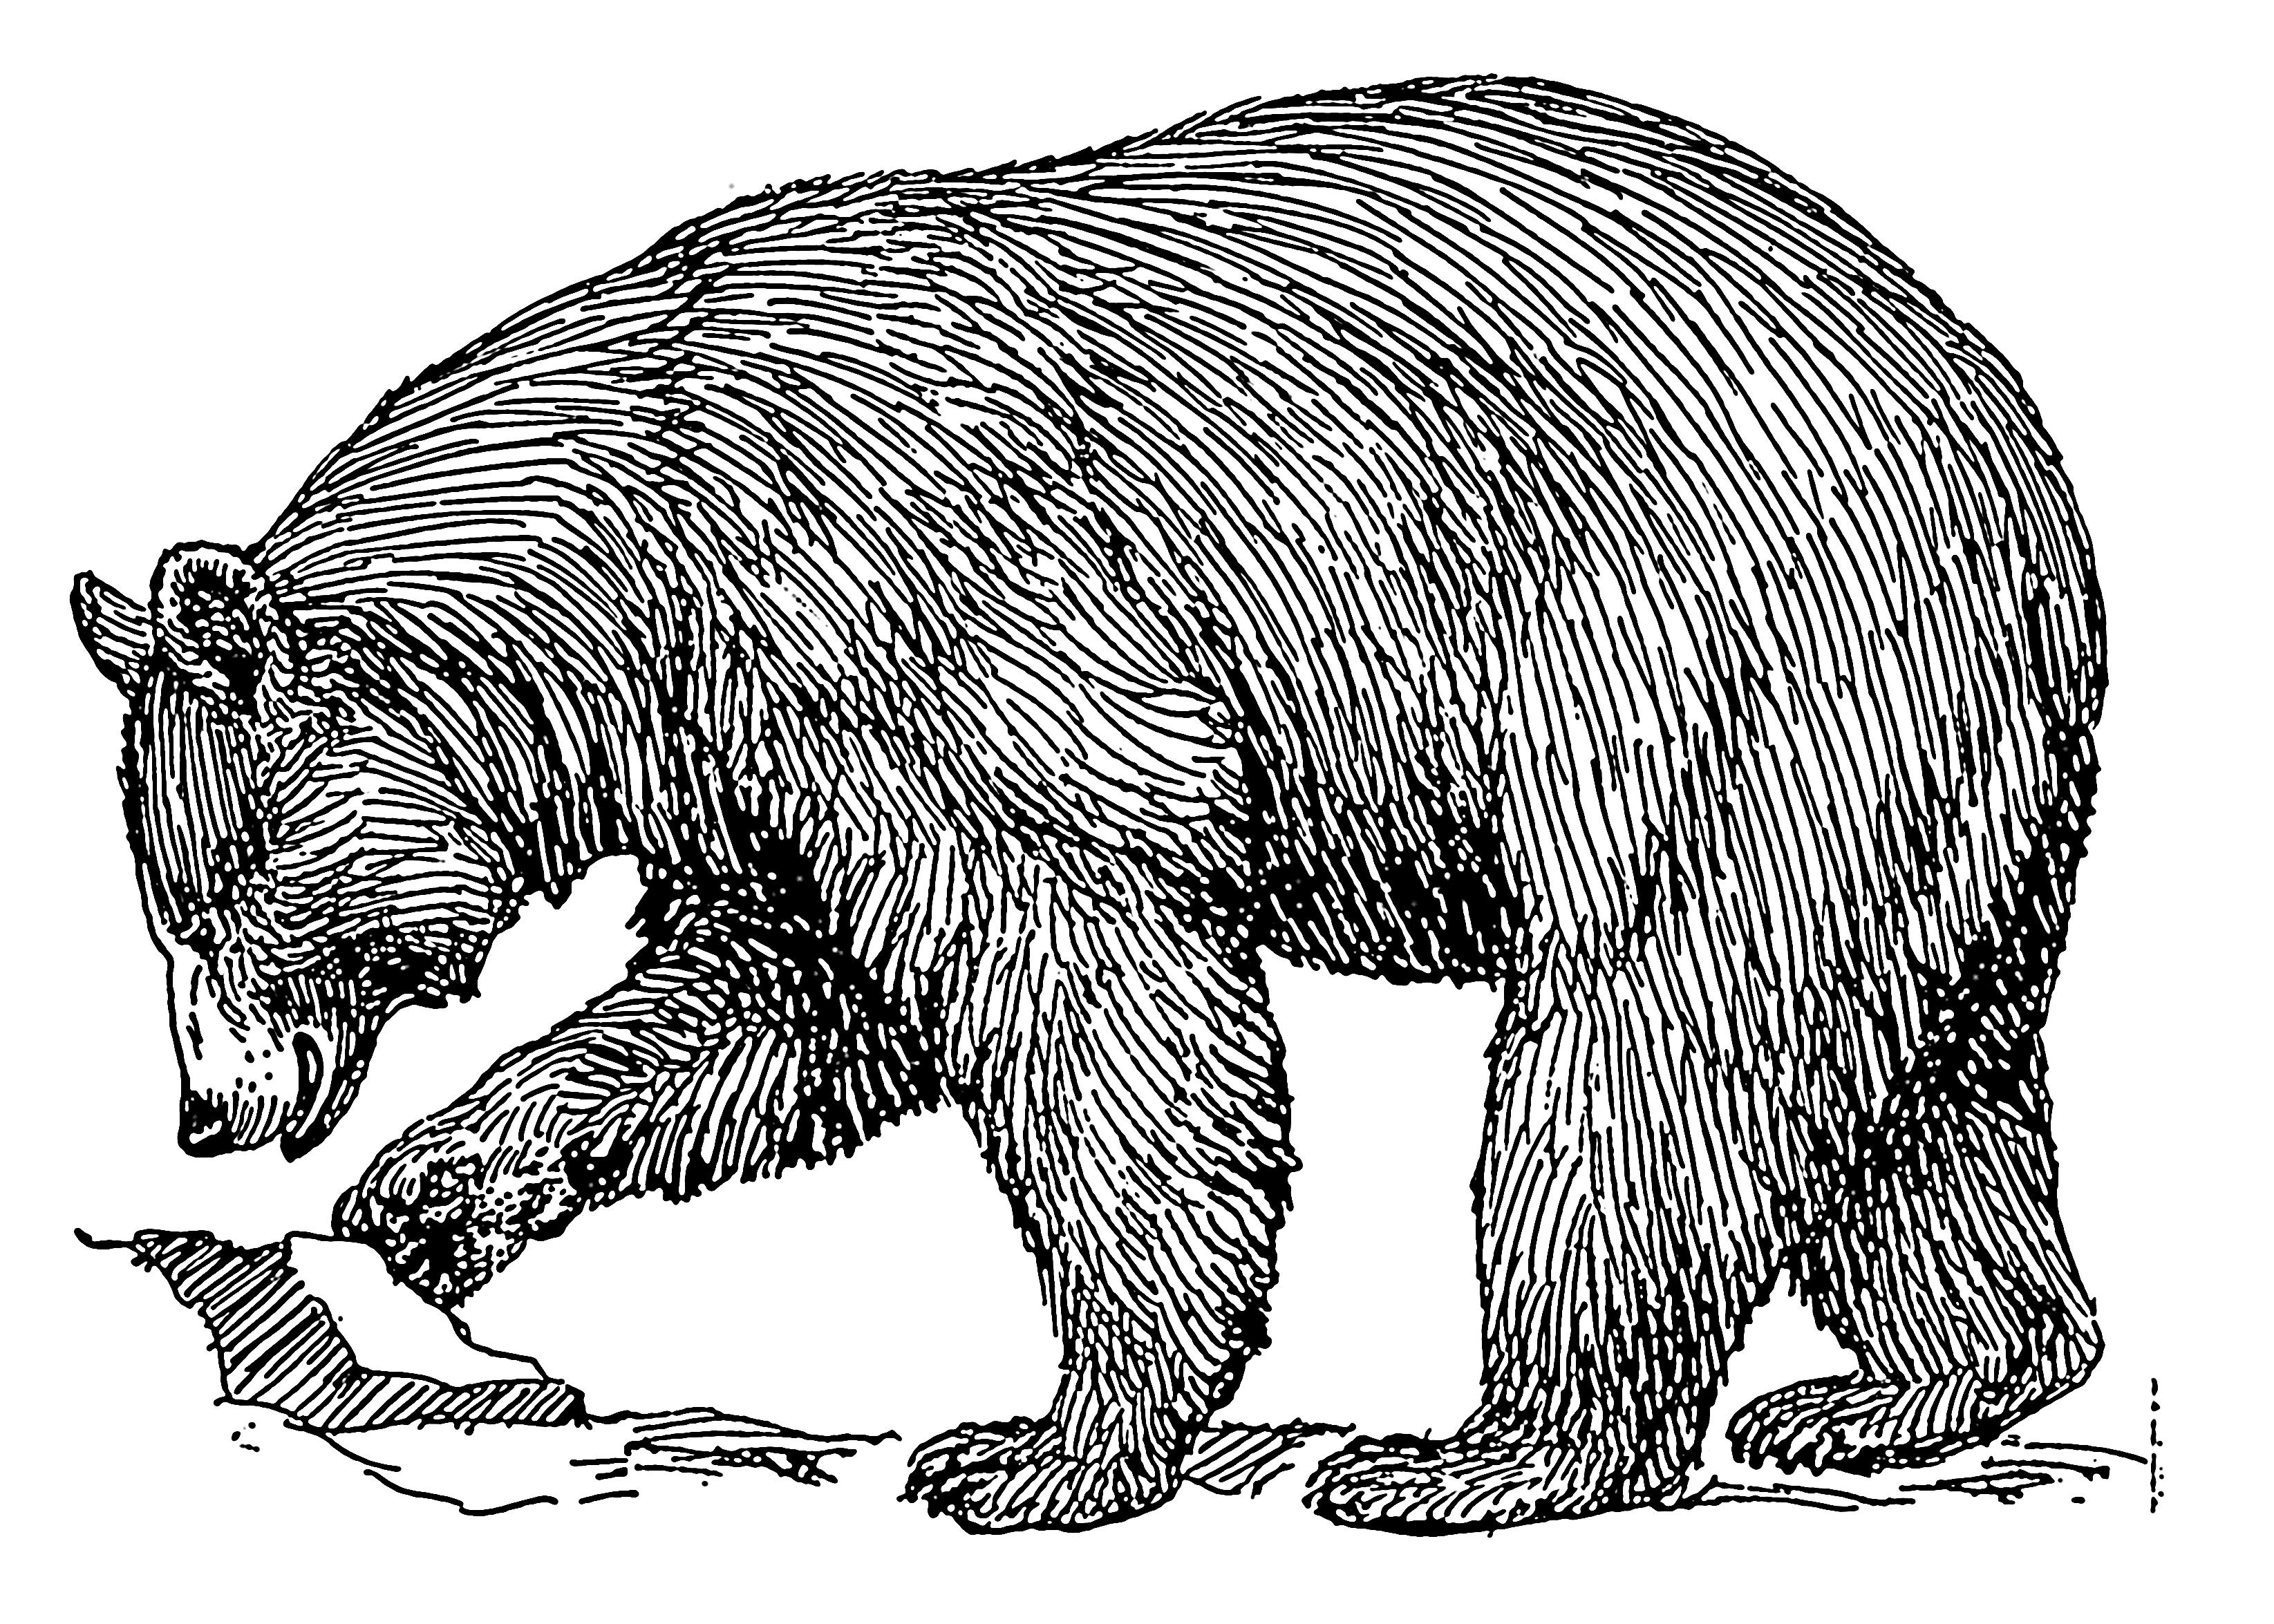 Black bear sketches - photo#4